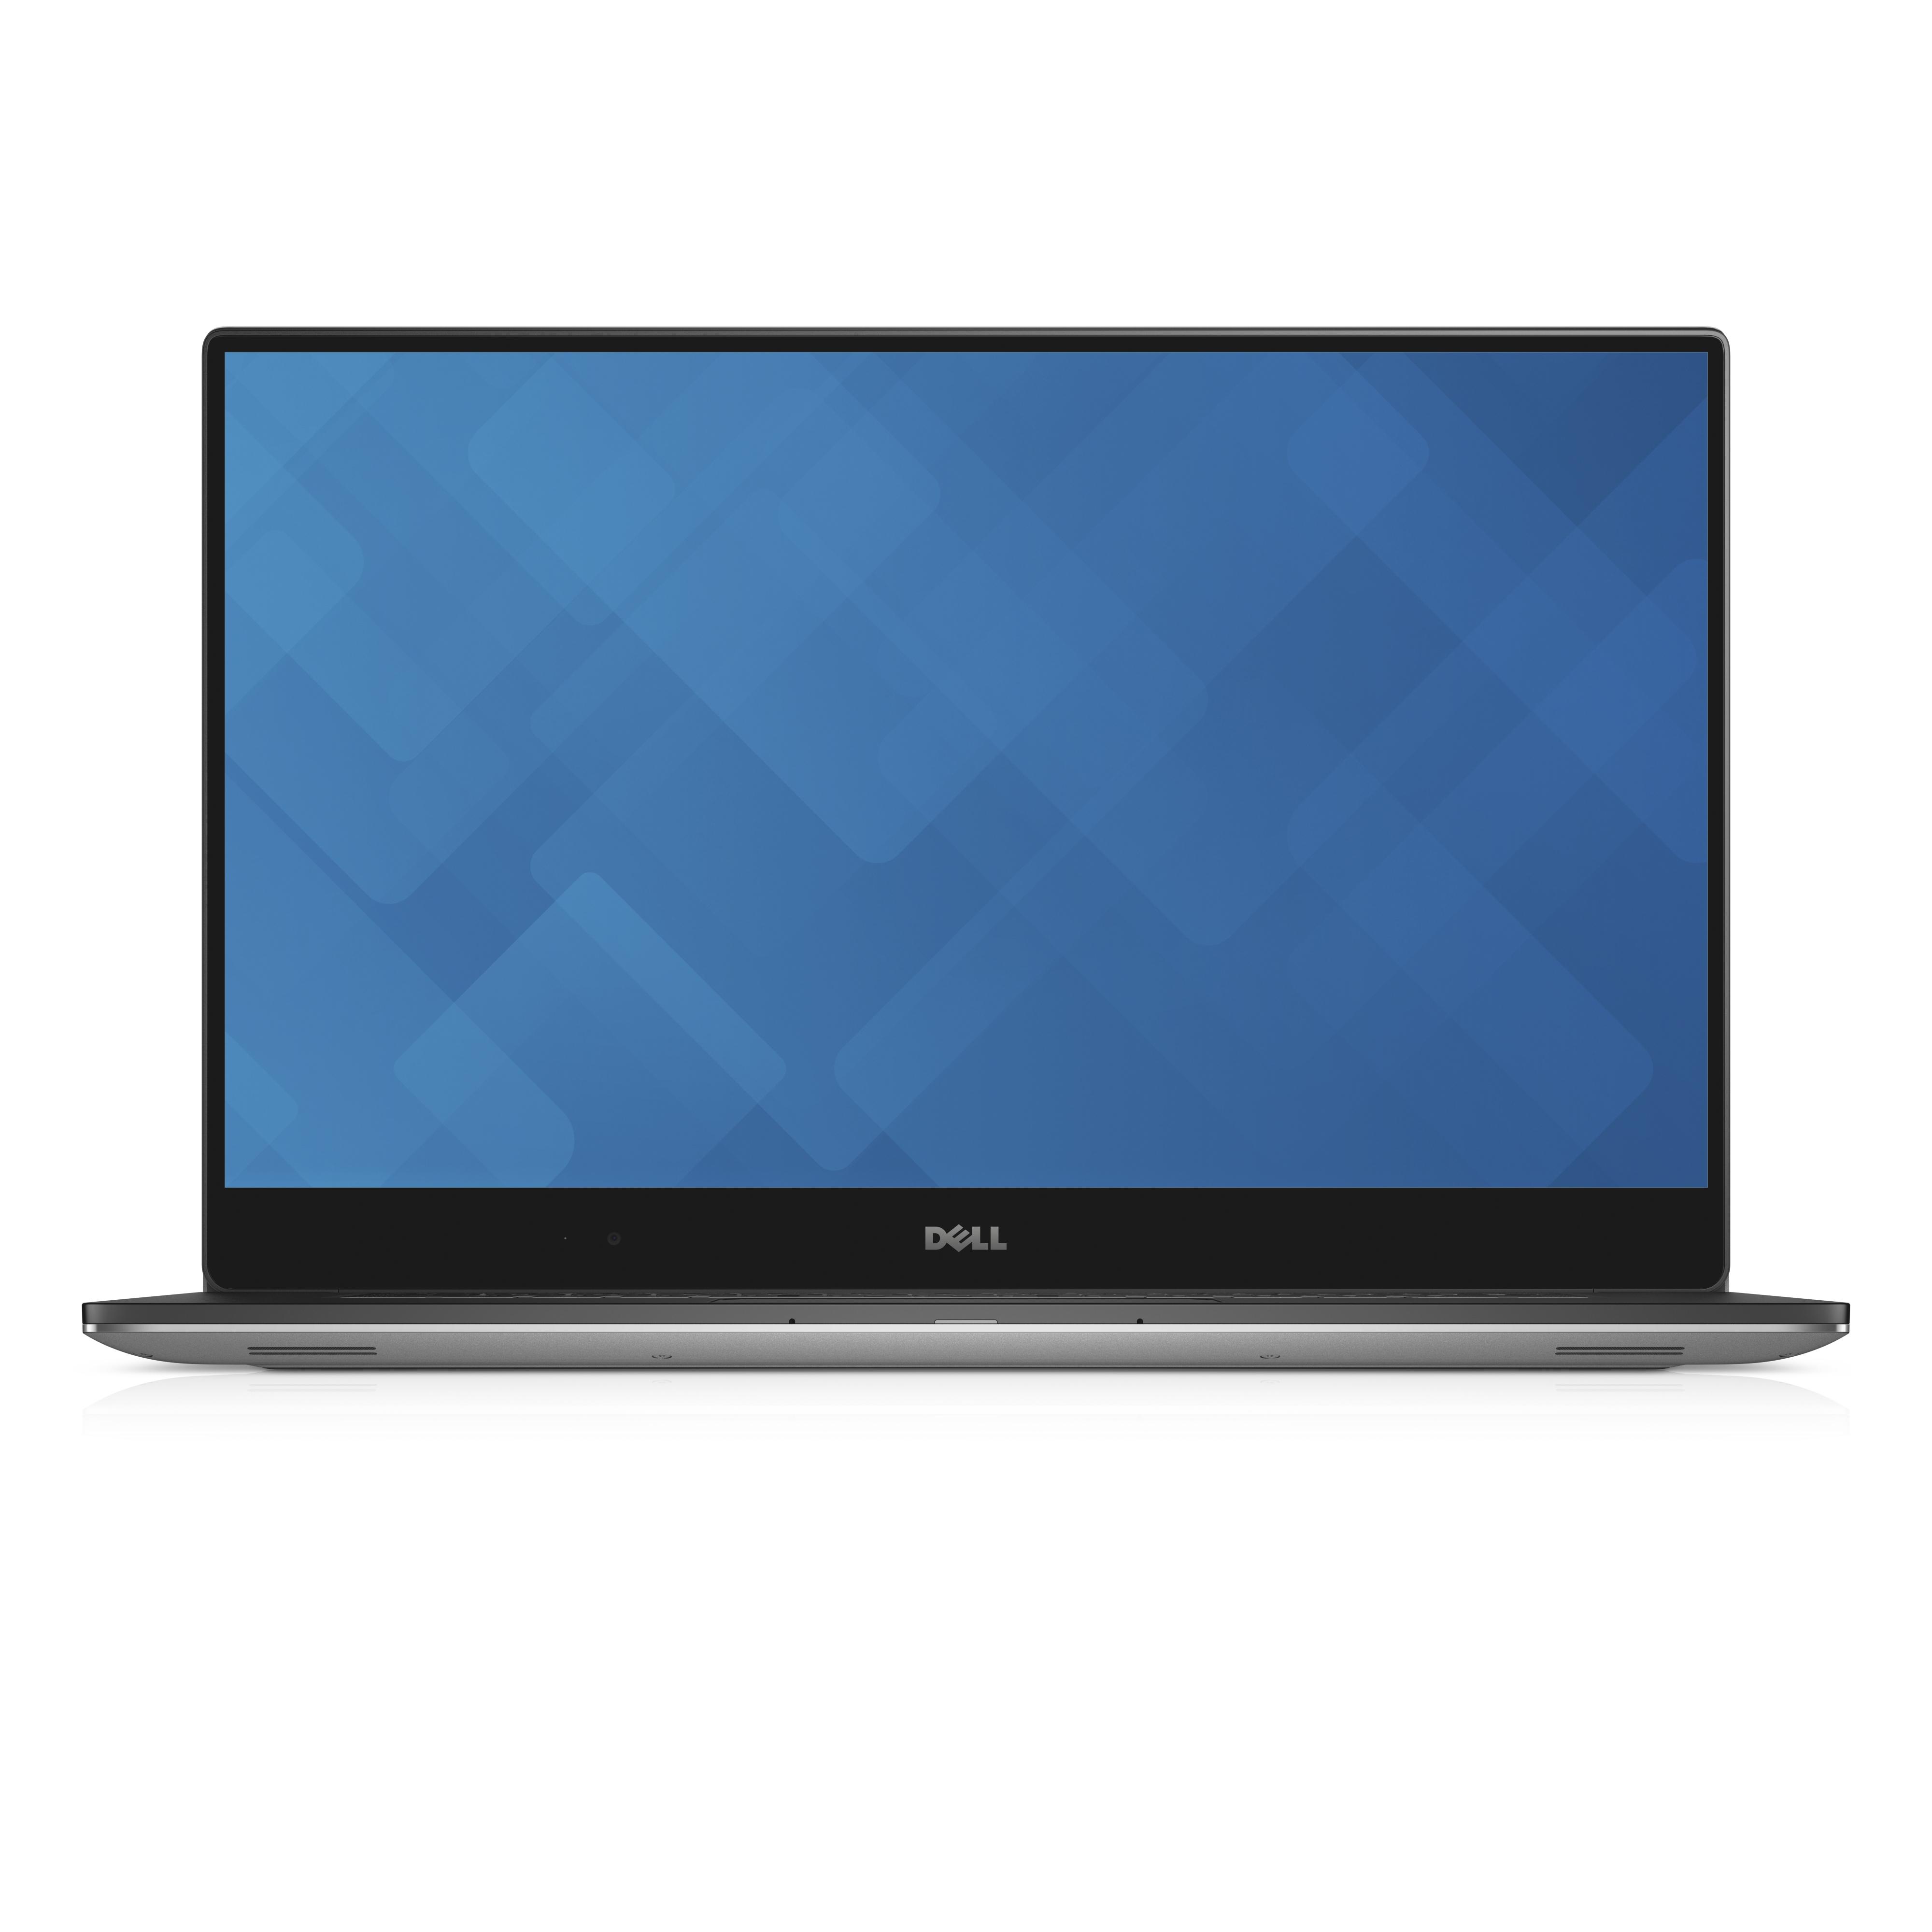 "DELL Precision M5510 2.7GHz i7-6820HQ 15.6"" 1920 x 1080pixels Touchscreen Black,Silver"